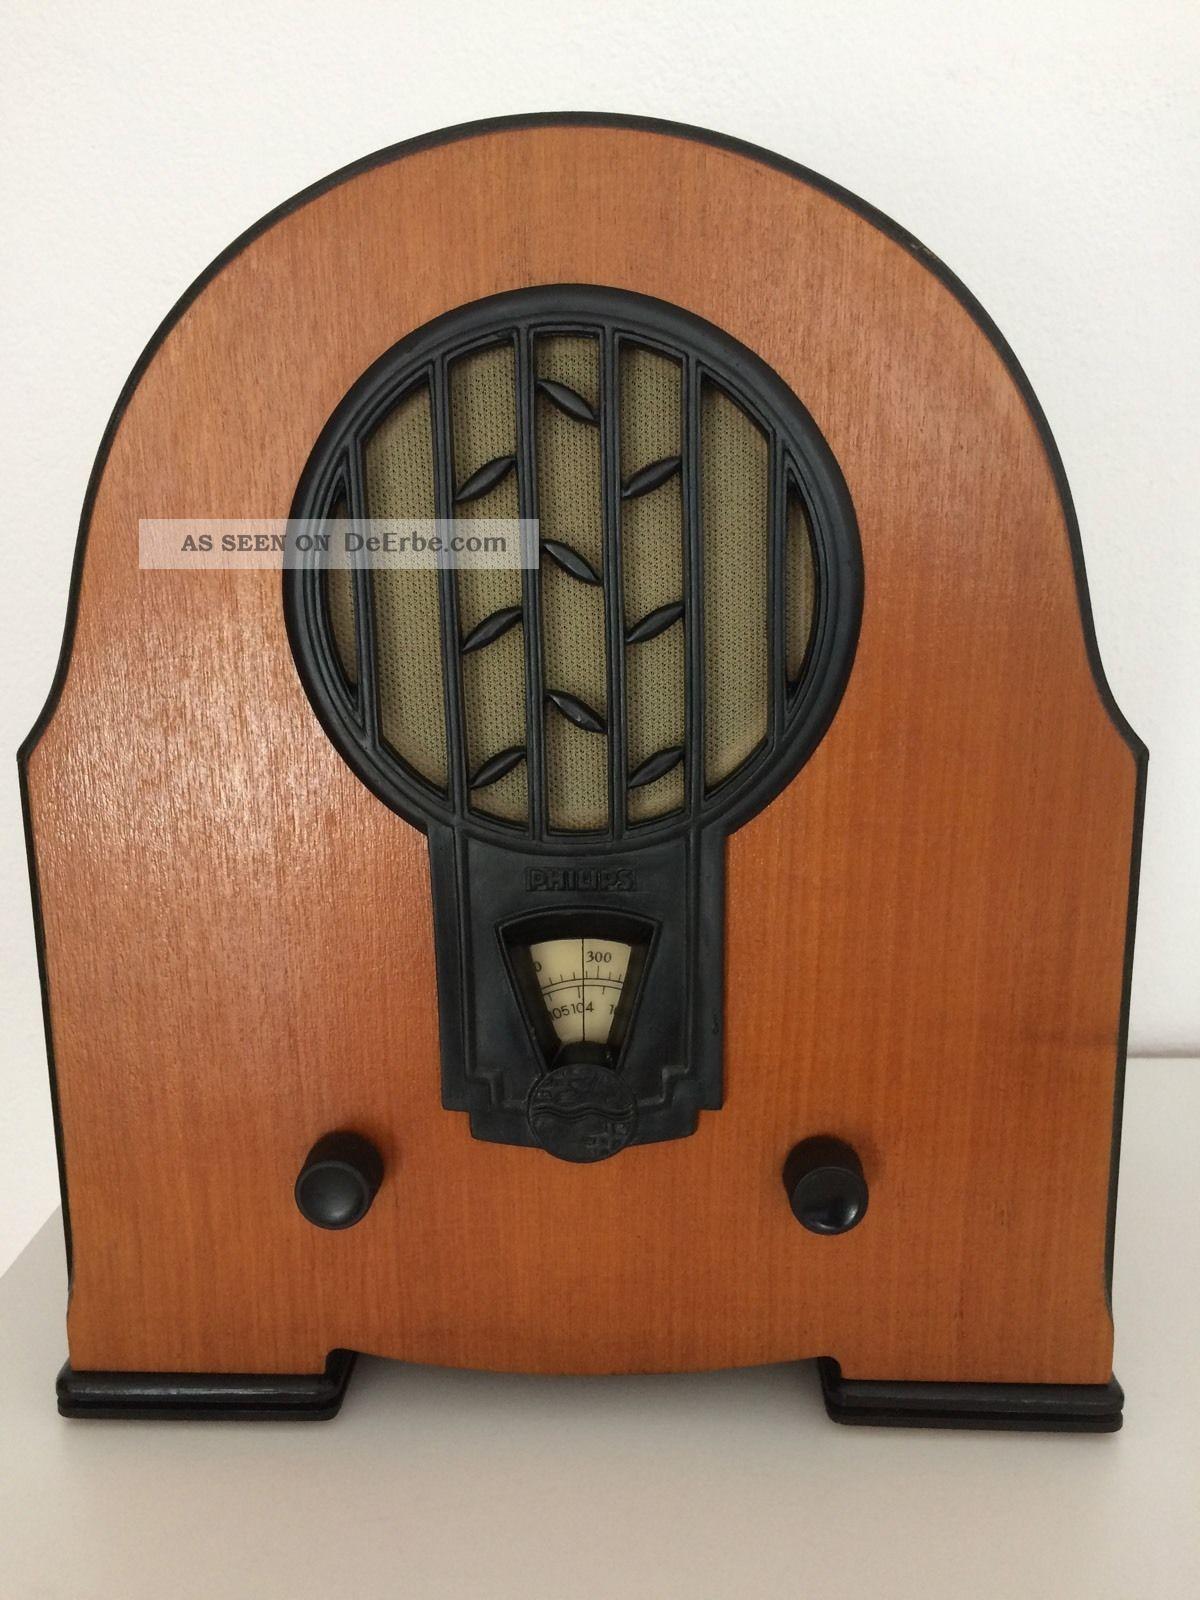 Philips Nostalgie Radio Rb 634/02 Antik Klassiker Retro Radio Antike Bild